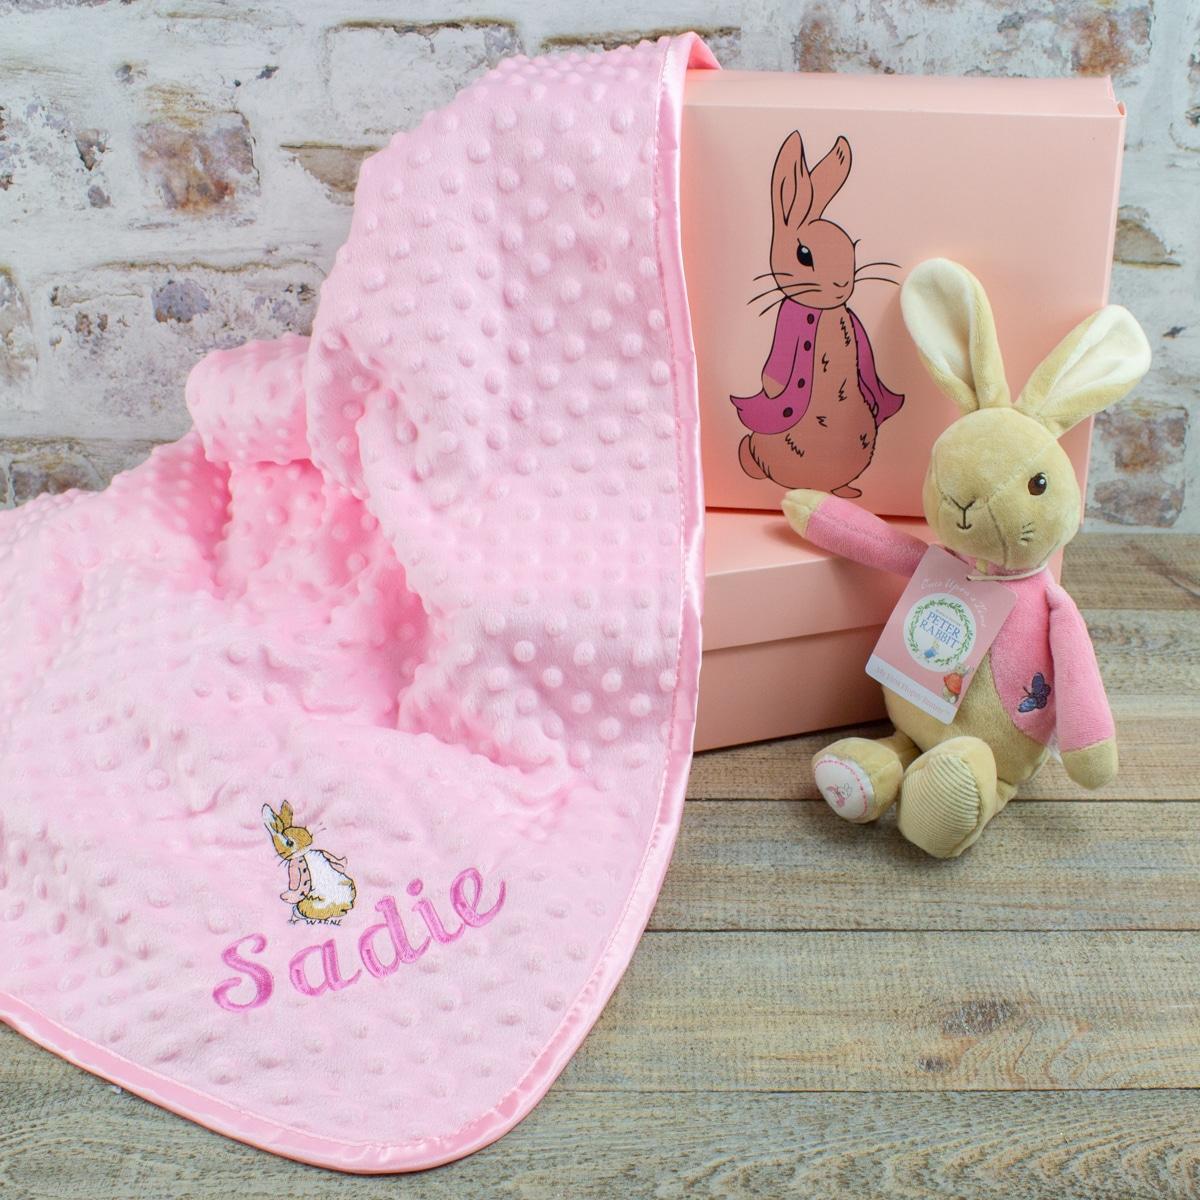 Personalised Flopsy rabbit baby gift set